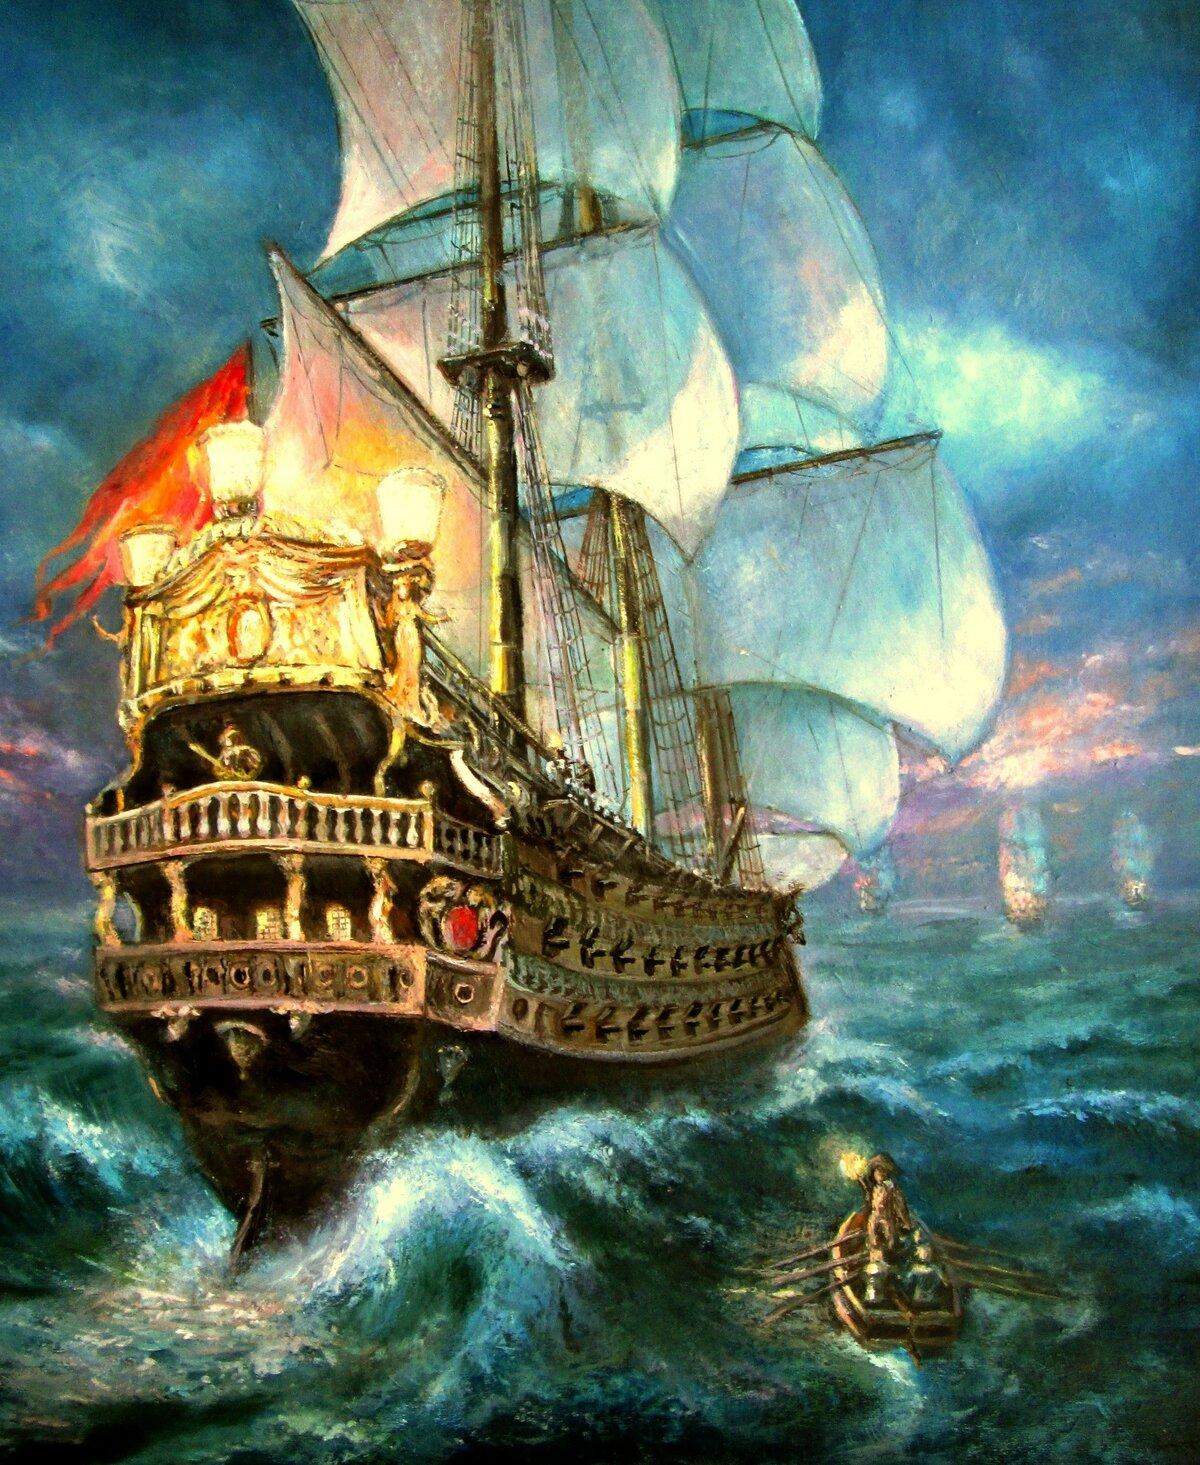 Картинка корабля для декупажа